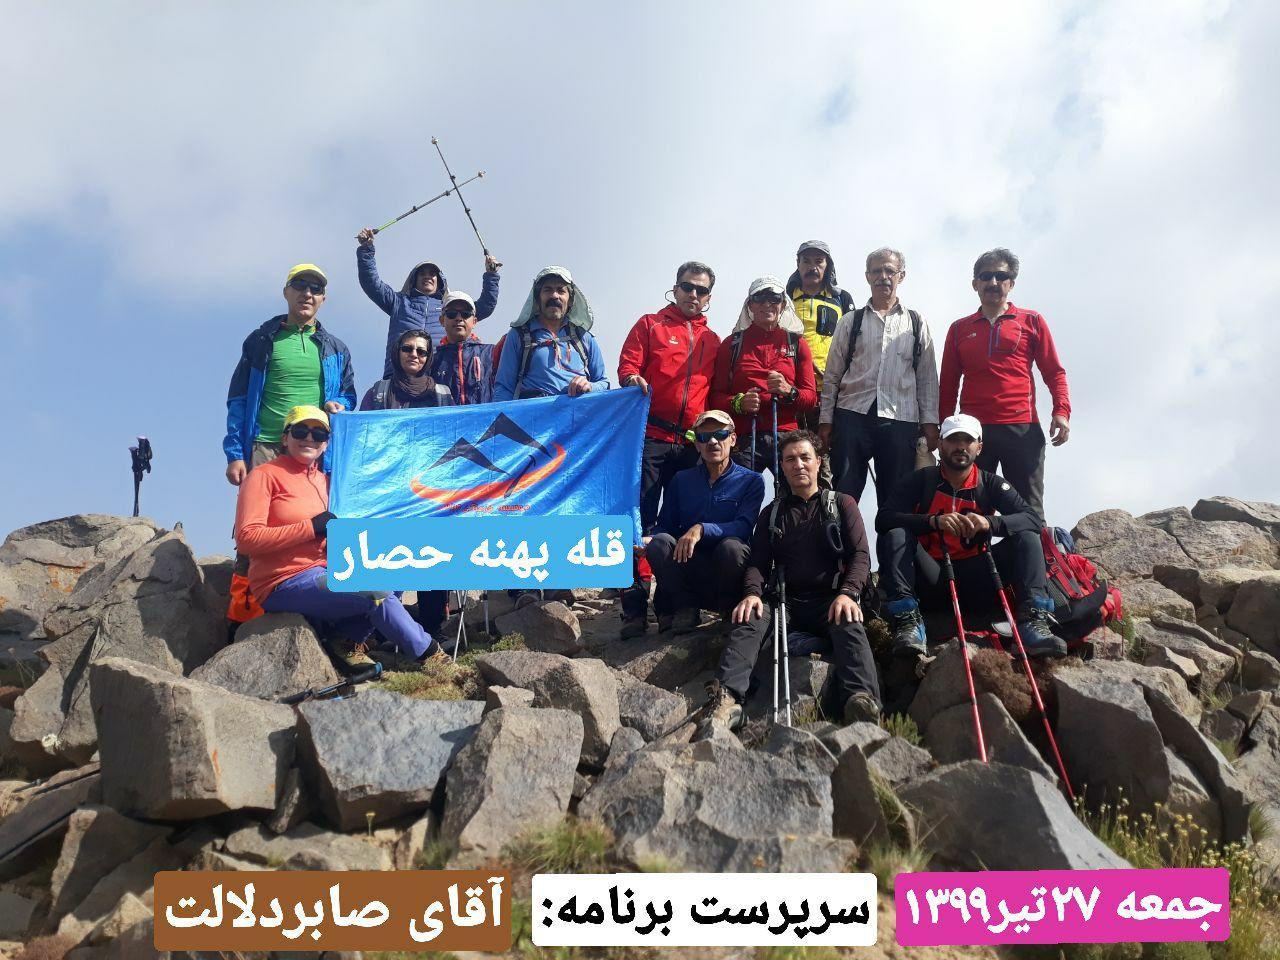 صعود همنوردان کانون کوه به قله پهنه حصار